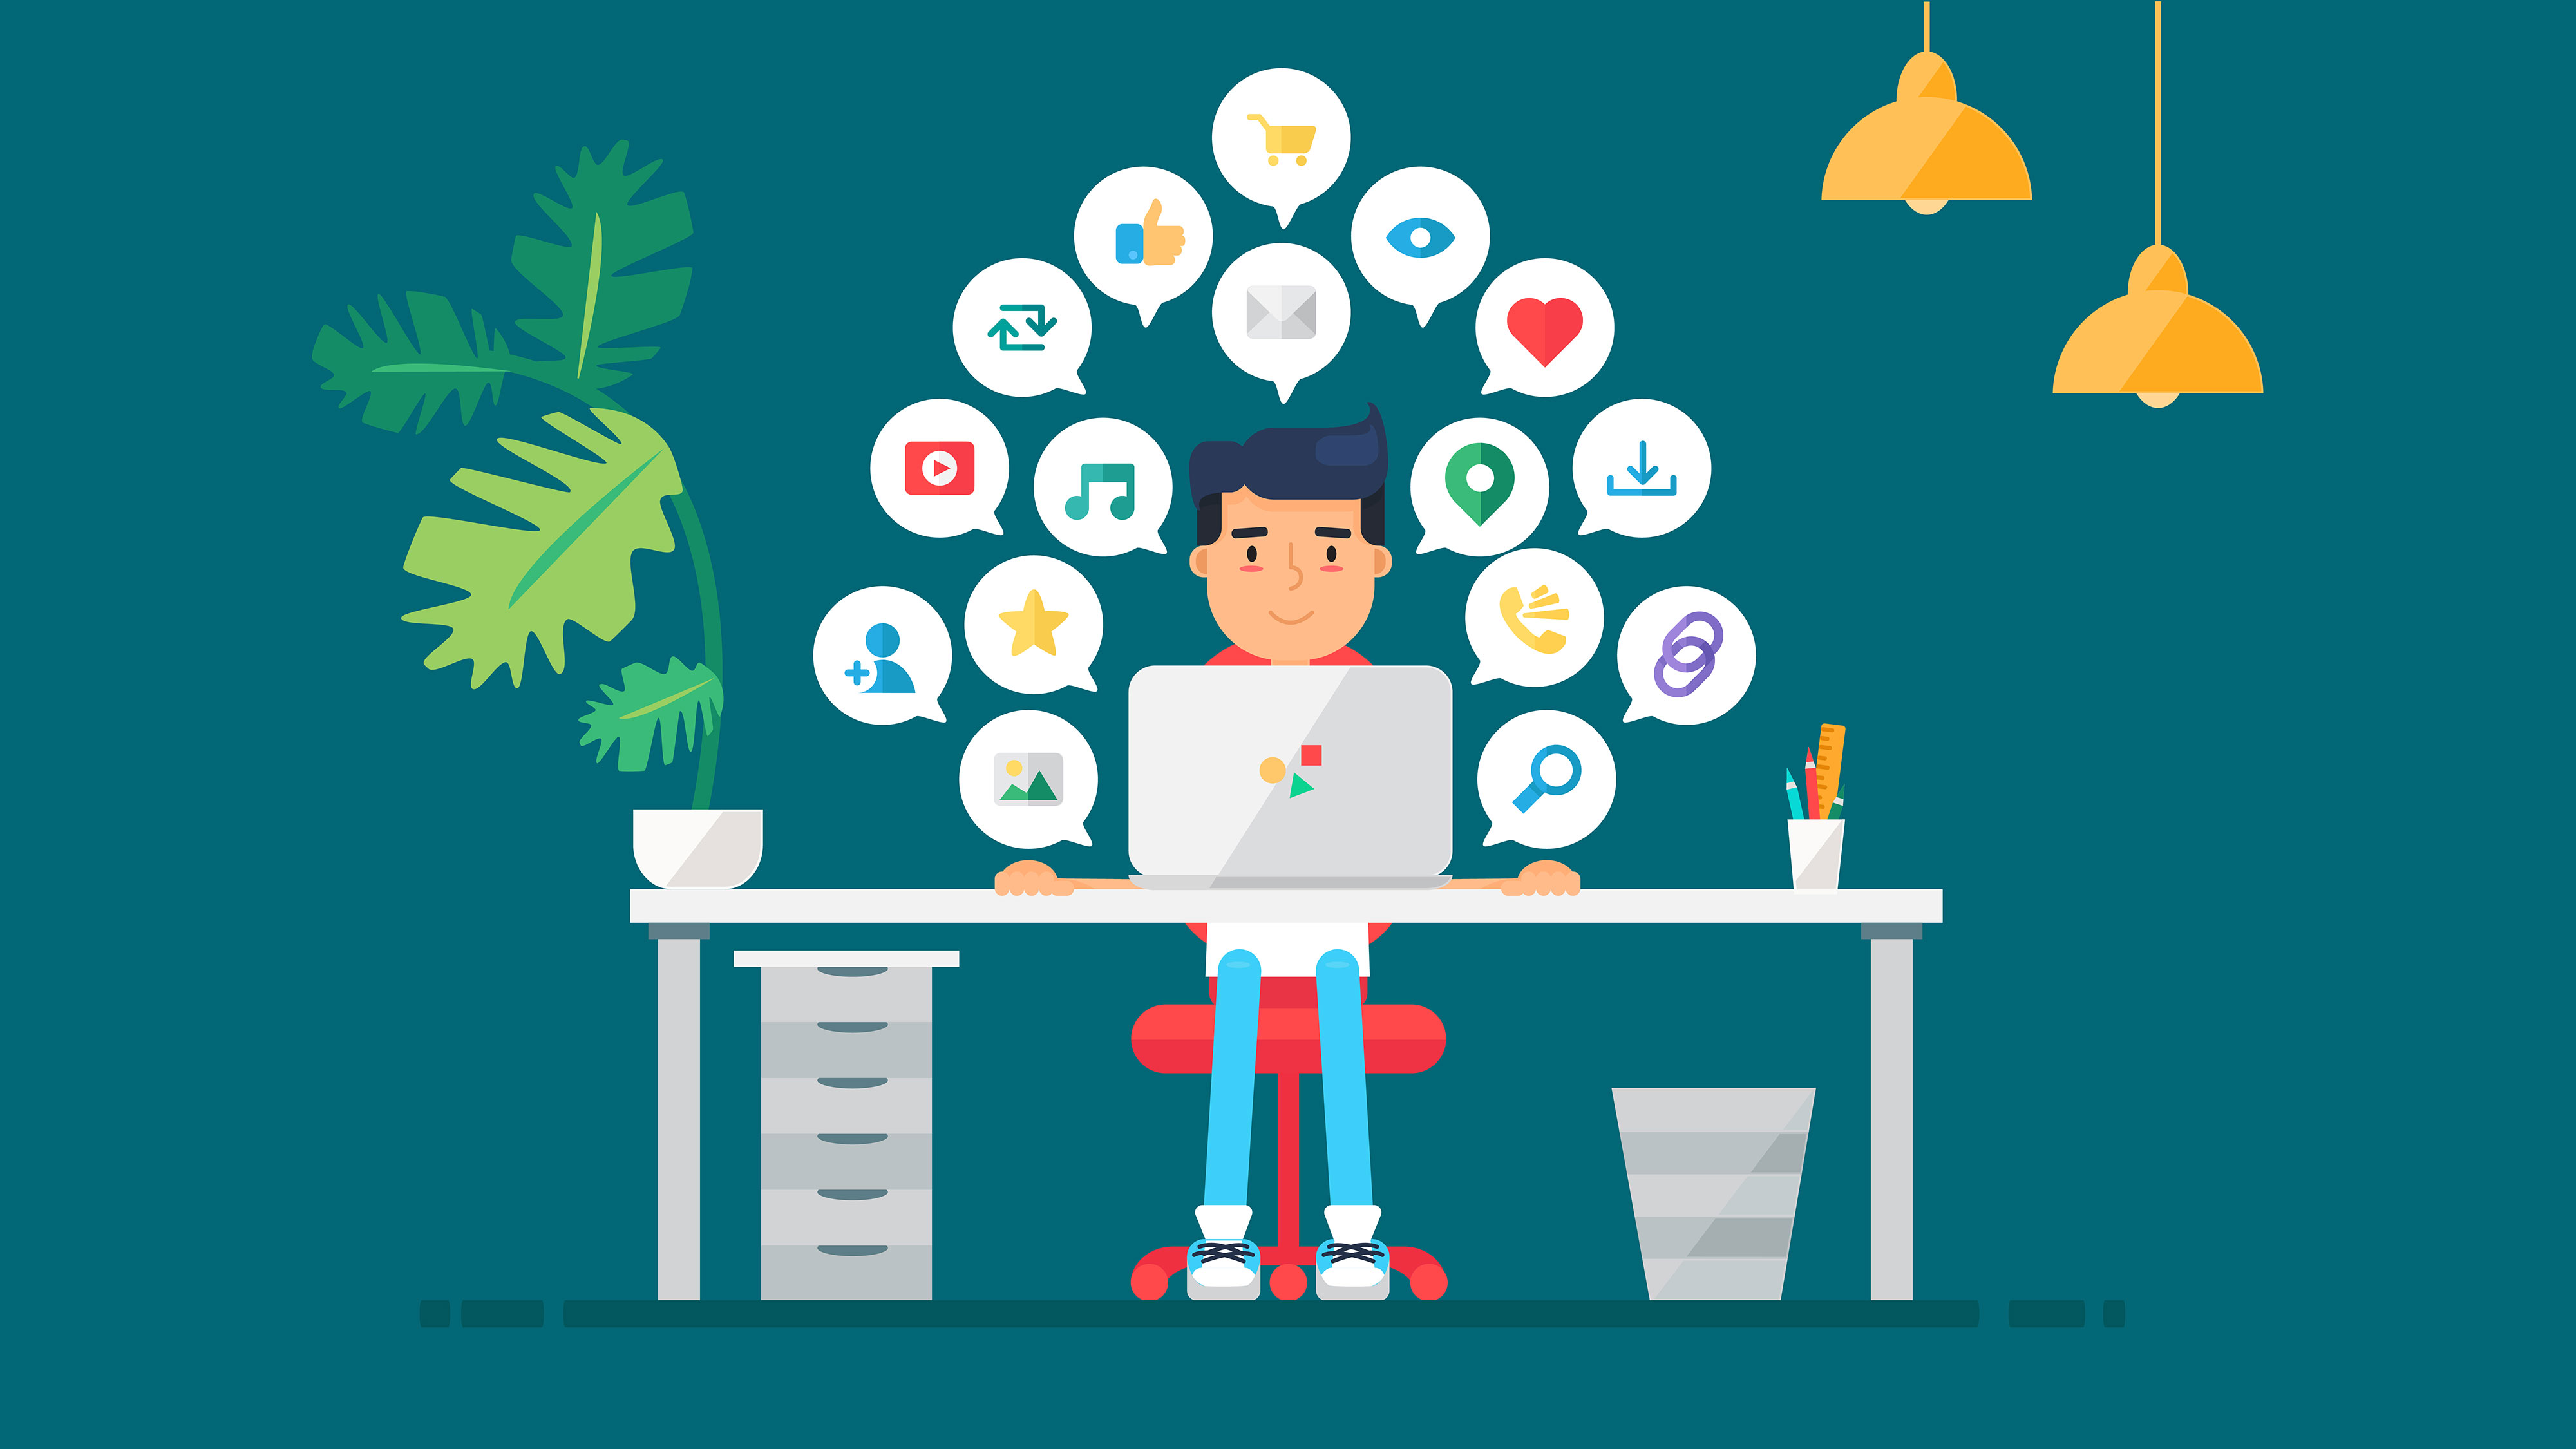 Contenido multimedia para redes sociales, culturina comunicación